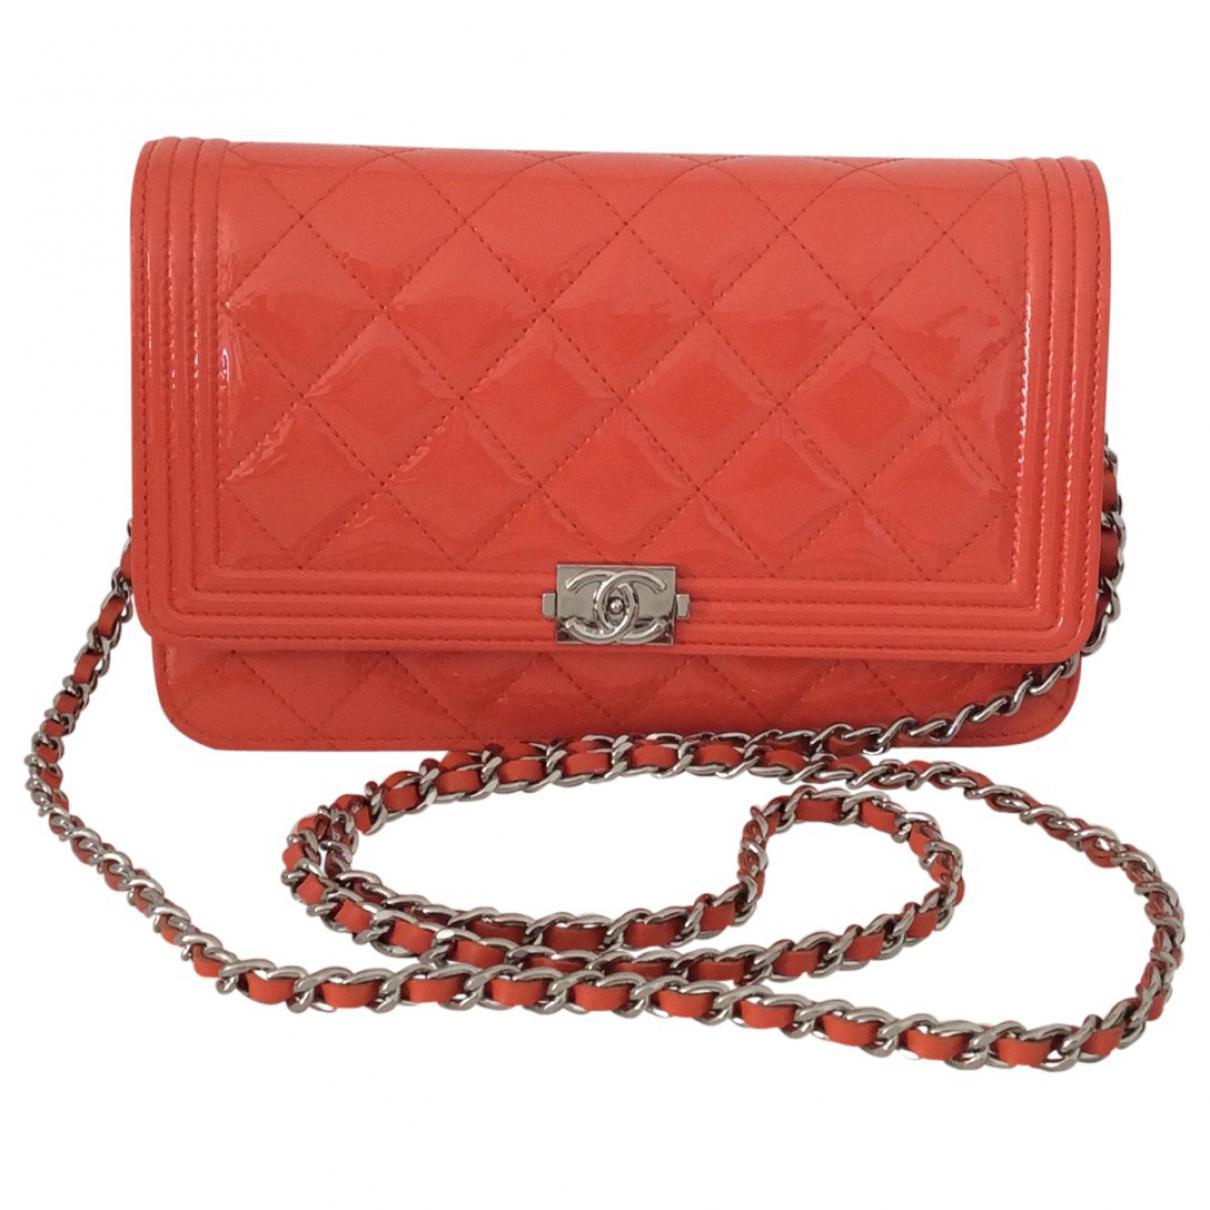 e969b9fe8b25 Lyst - Chanel Orange Patent Leather Handbag Boy in Orange